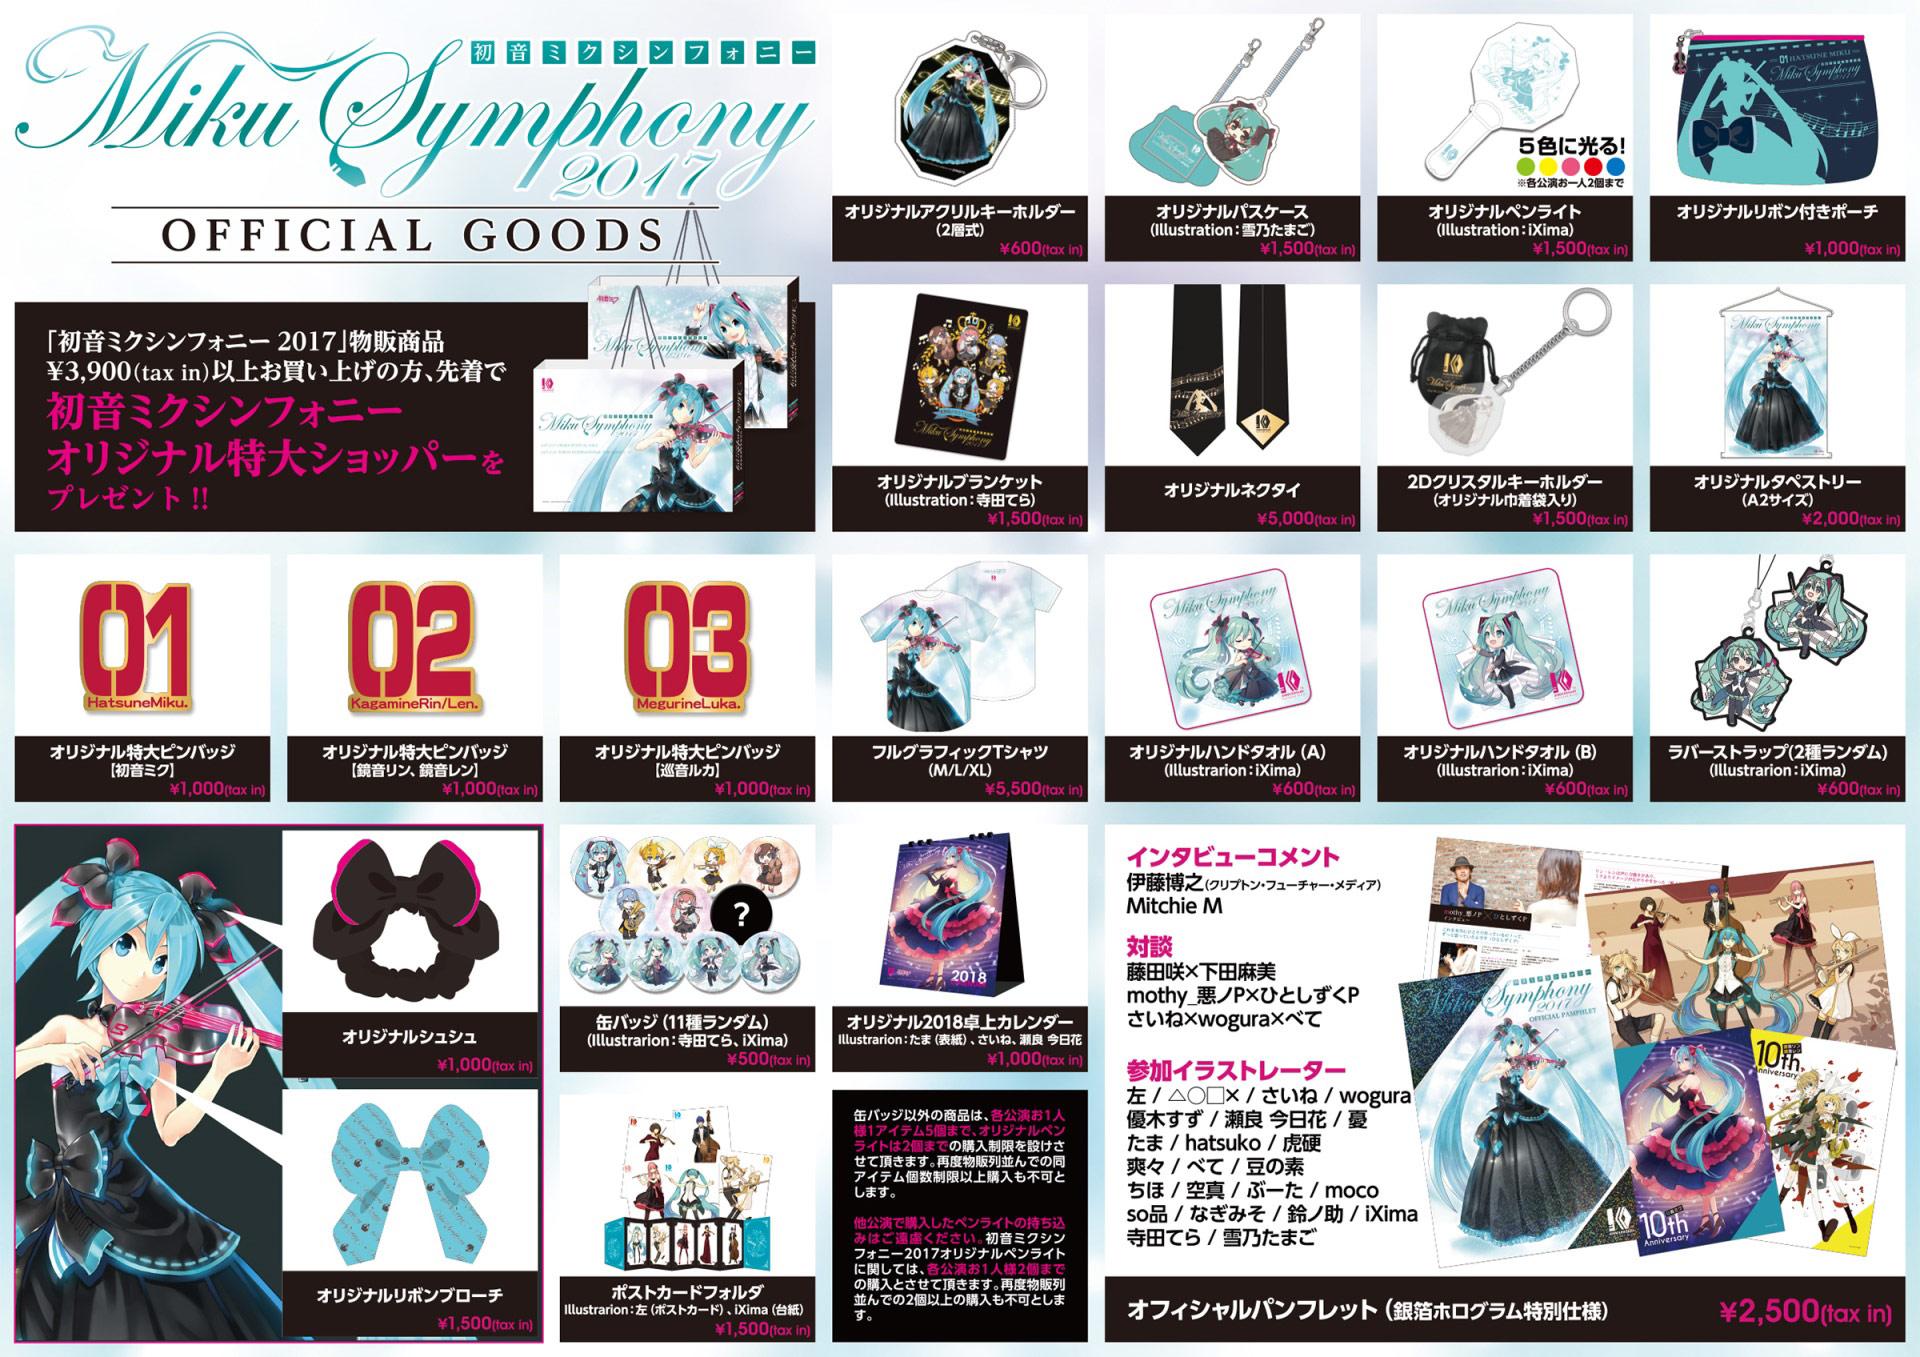 Image of Hatsune Miku Symphony 2017 Merchandise wide